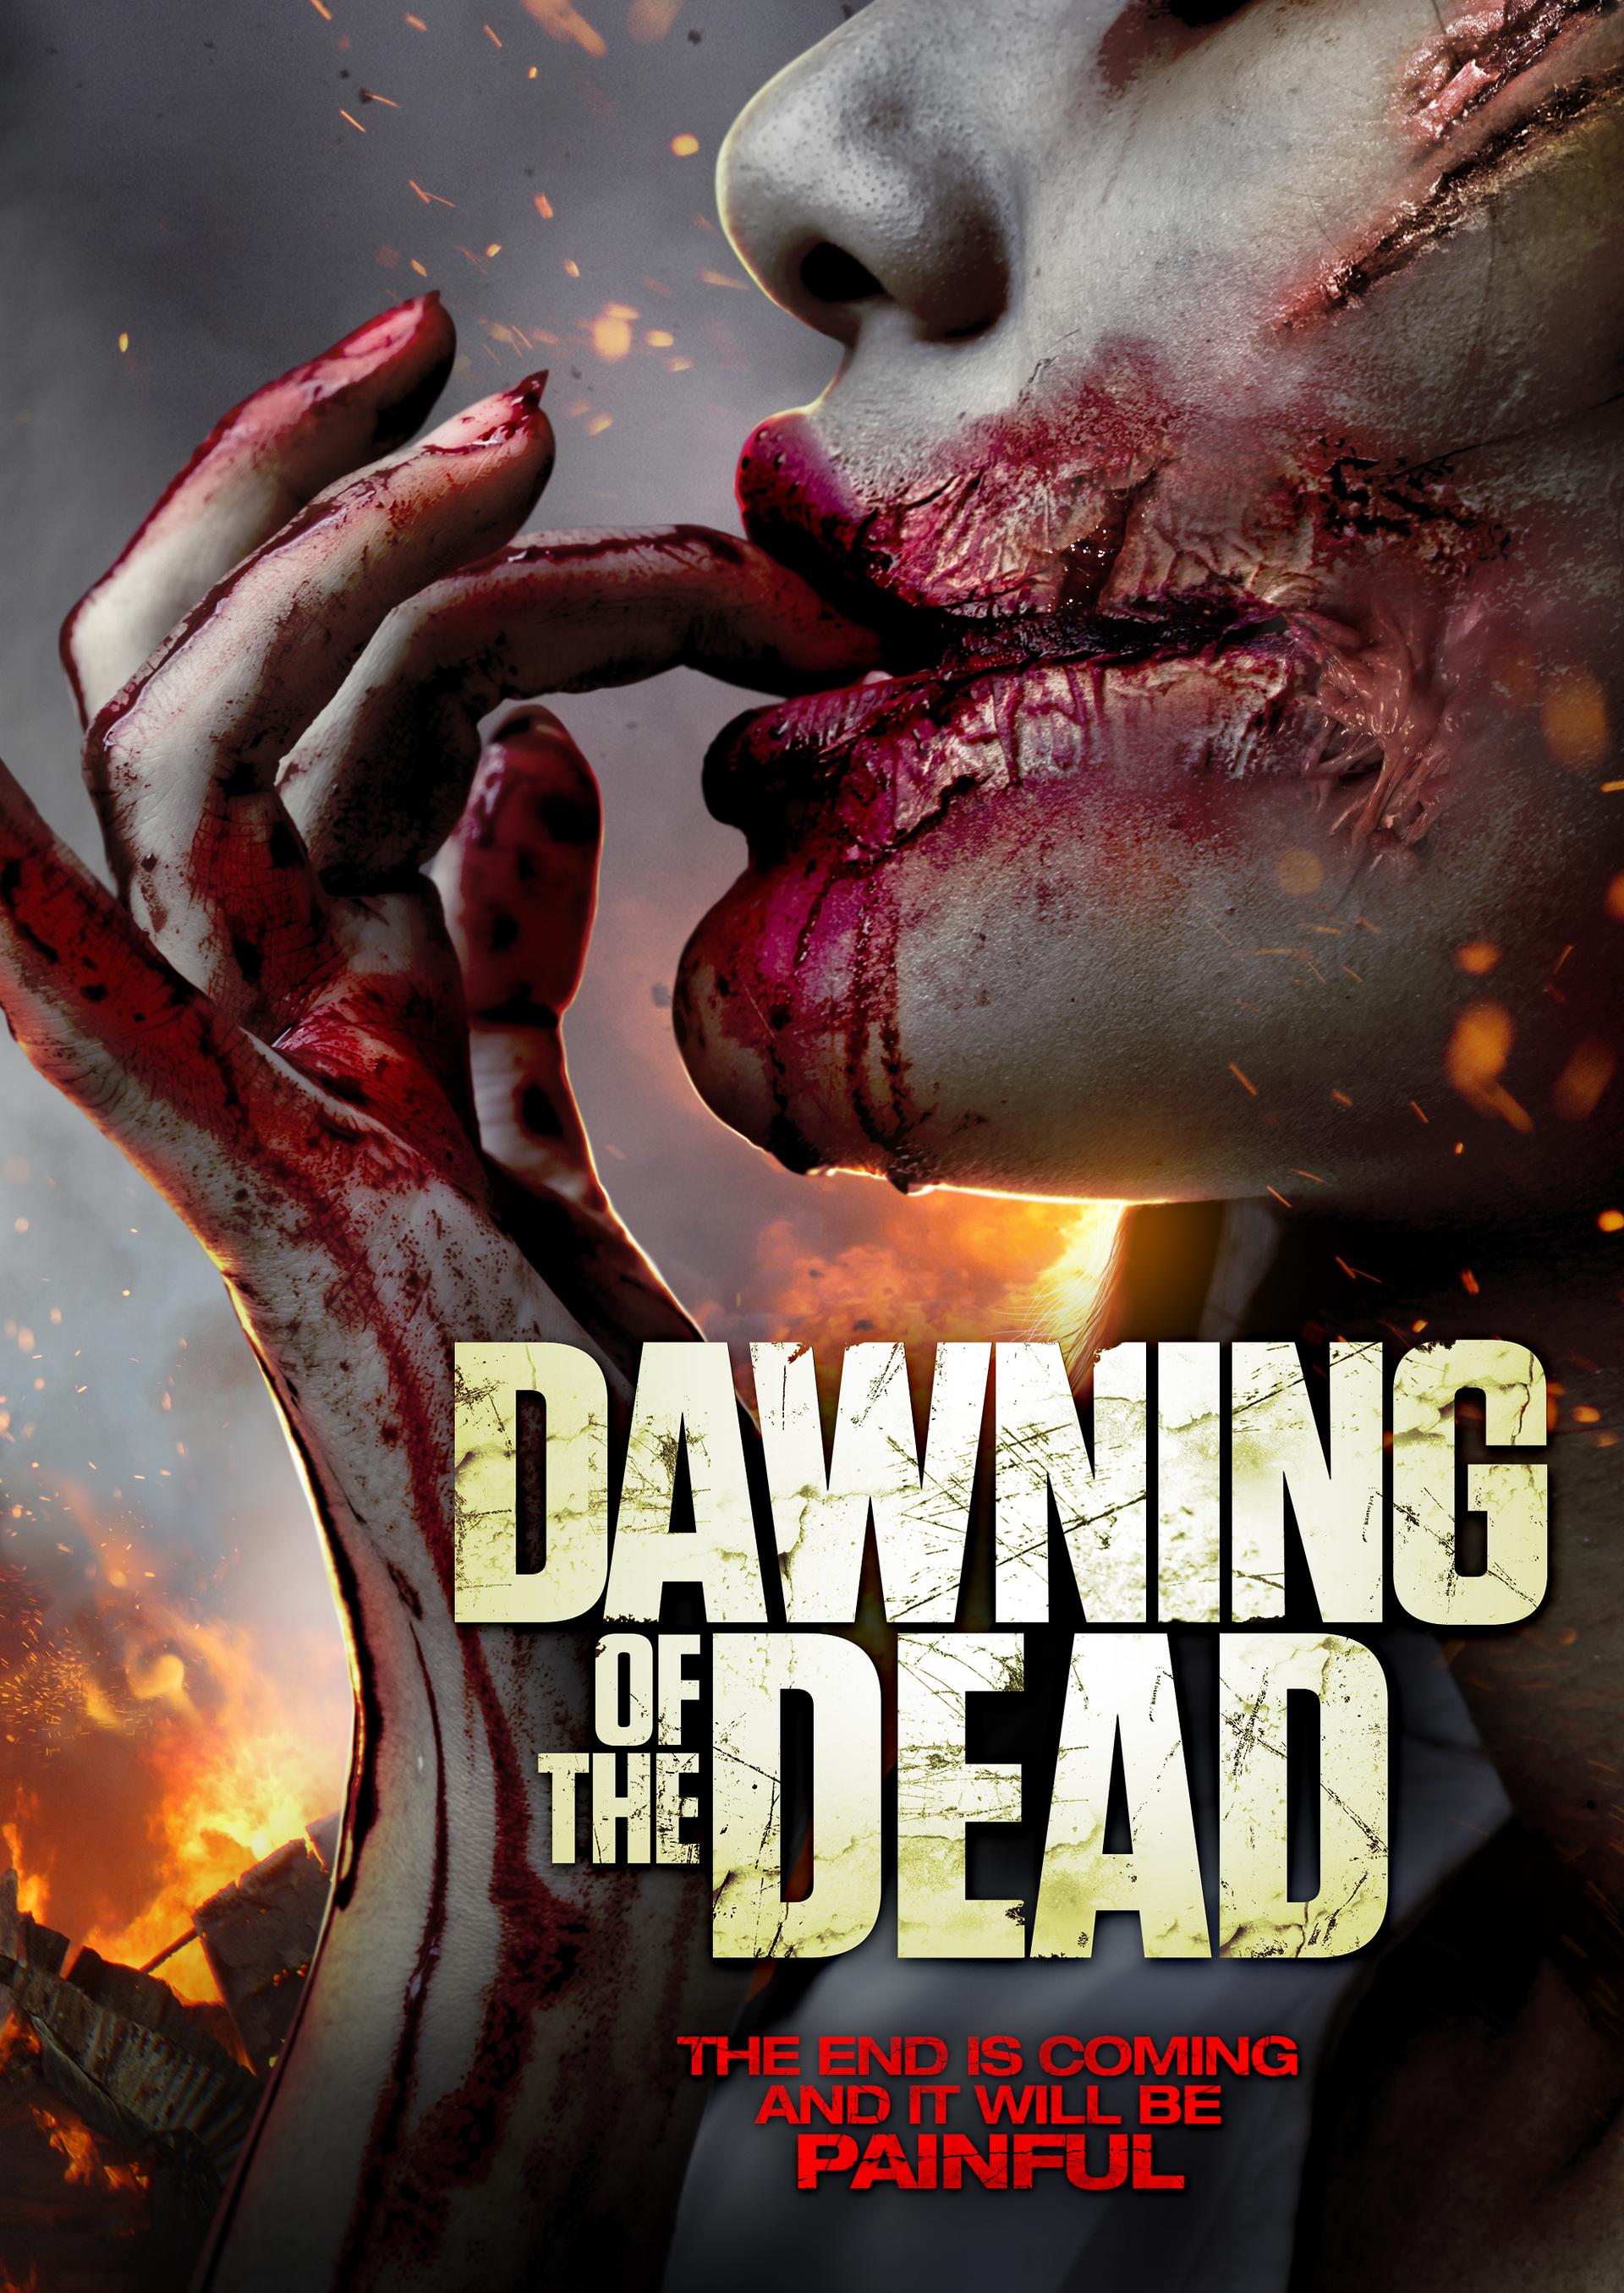 DAWNING_OF_THE_DEAD-KEY_ART-FLAT.jpg?1565018739